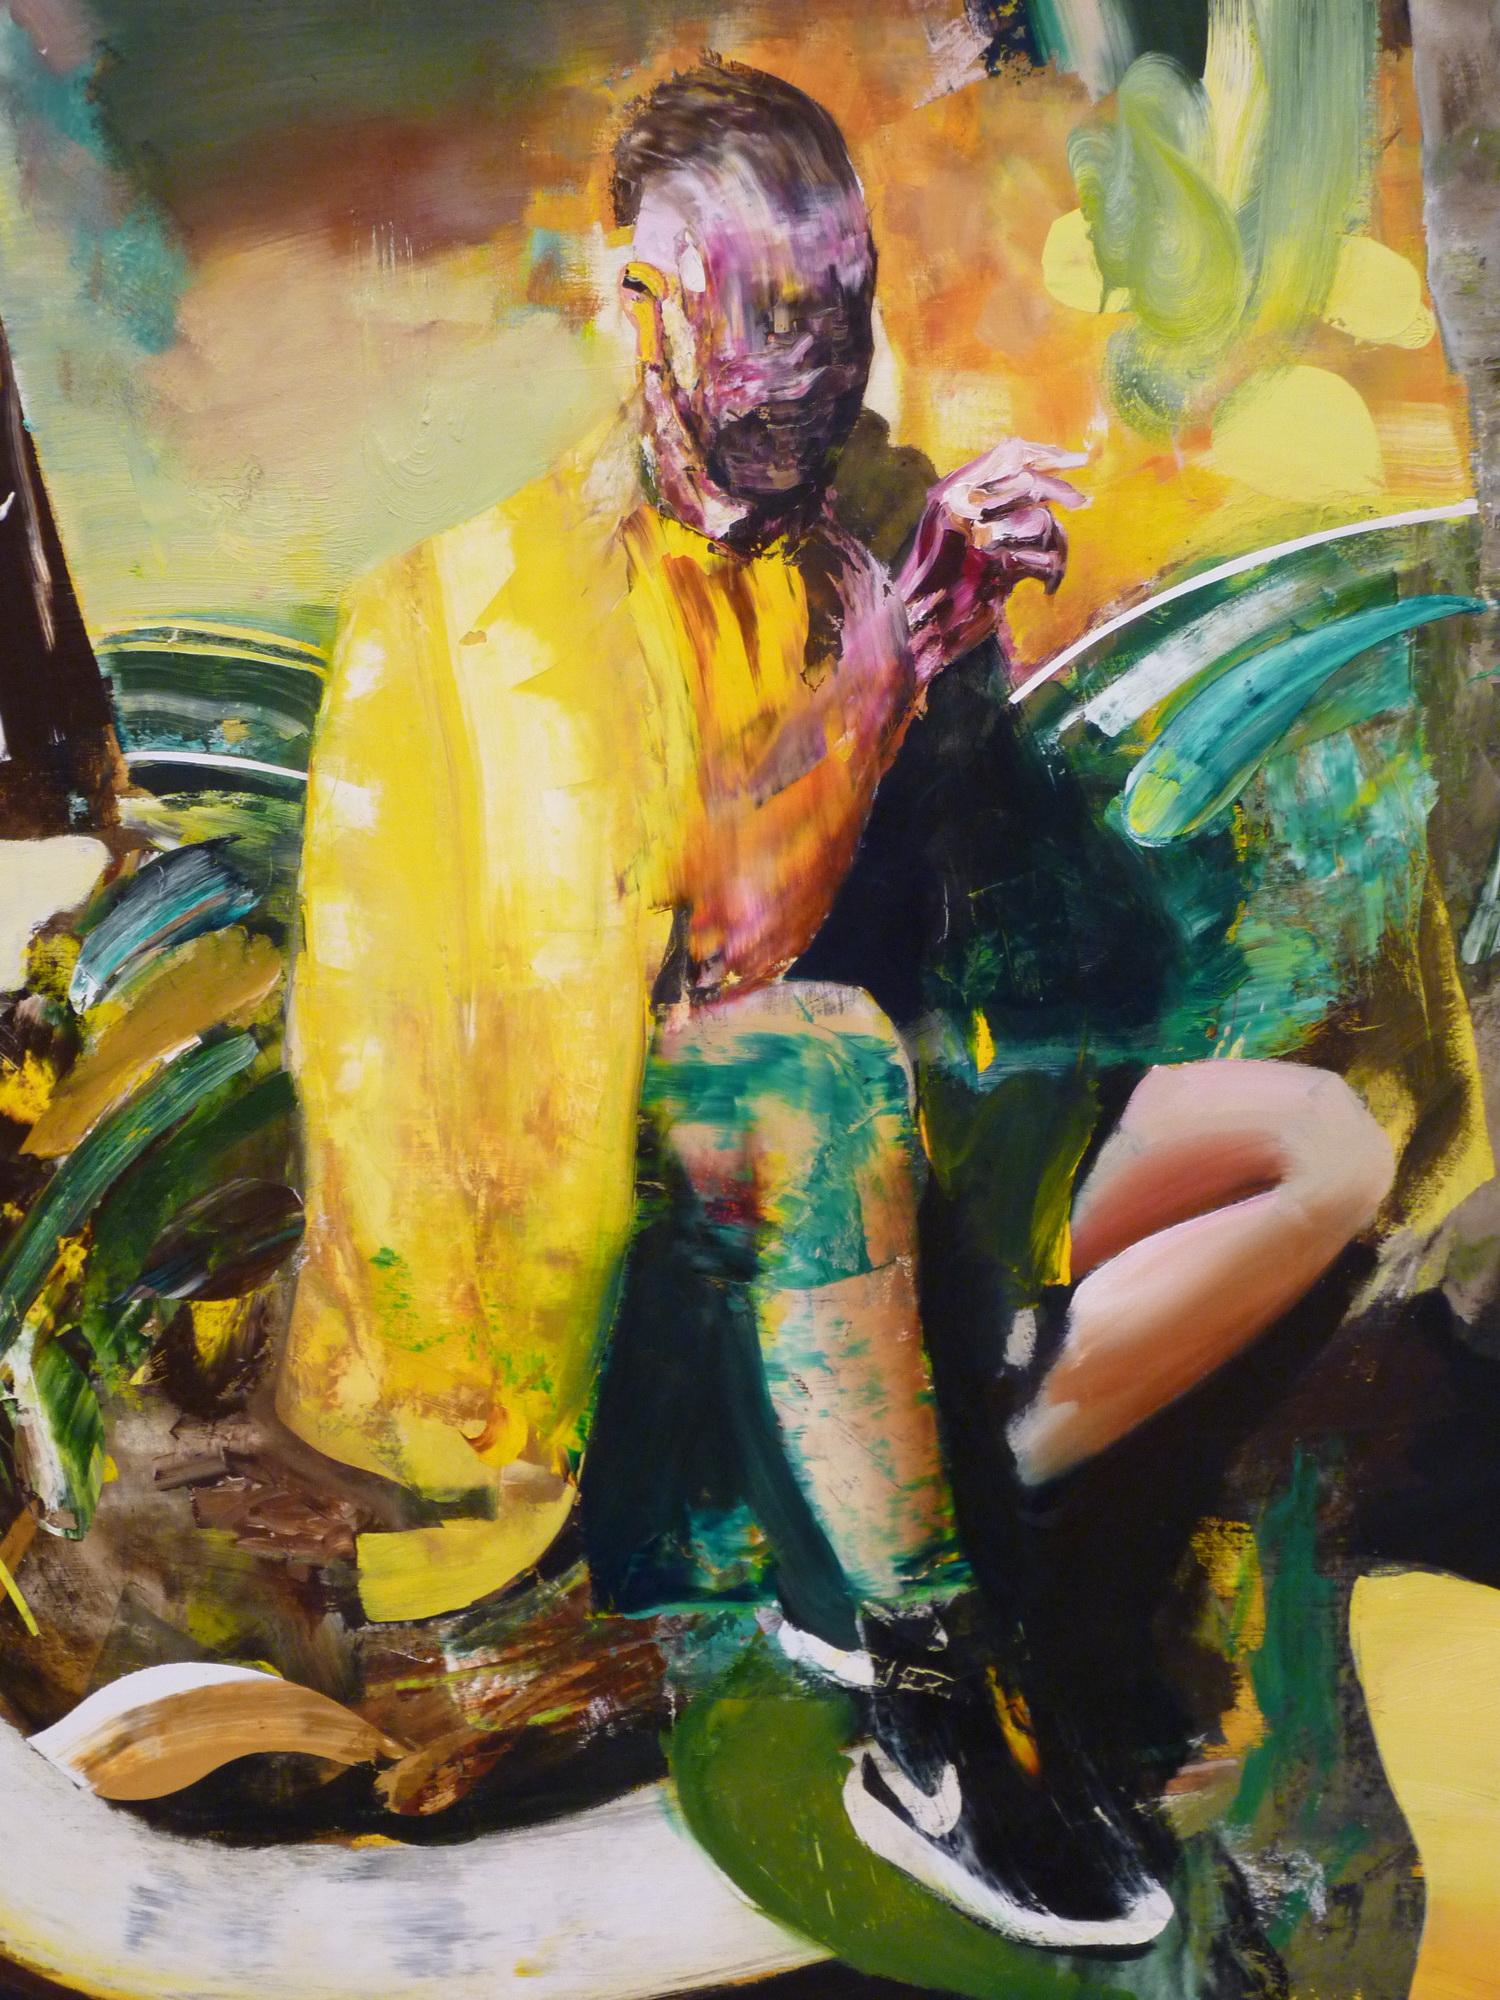 019-8 Adrian Ghenie  ne1977  self-portrait  230x160cm 2015 huile sur toile